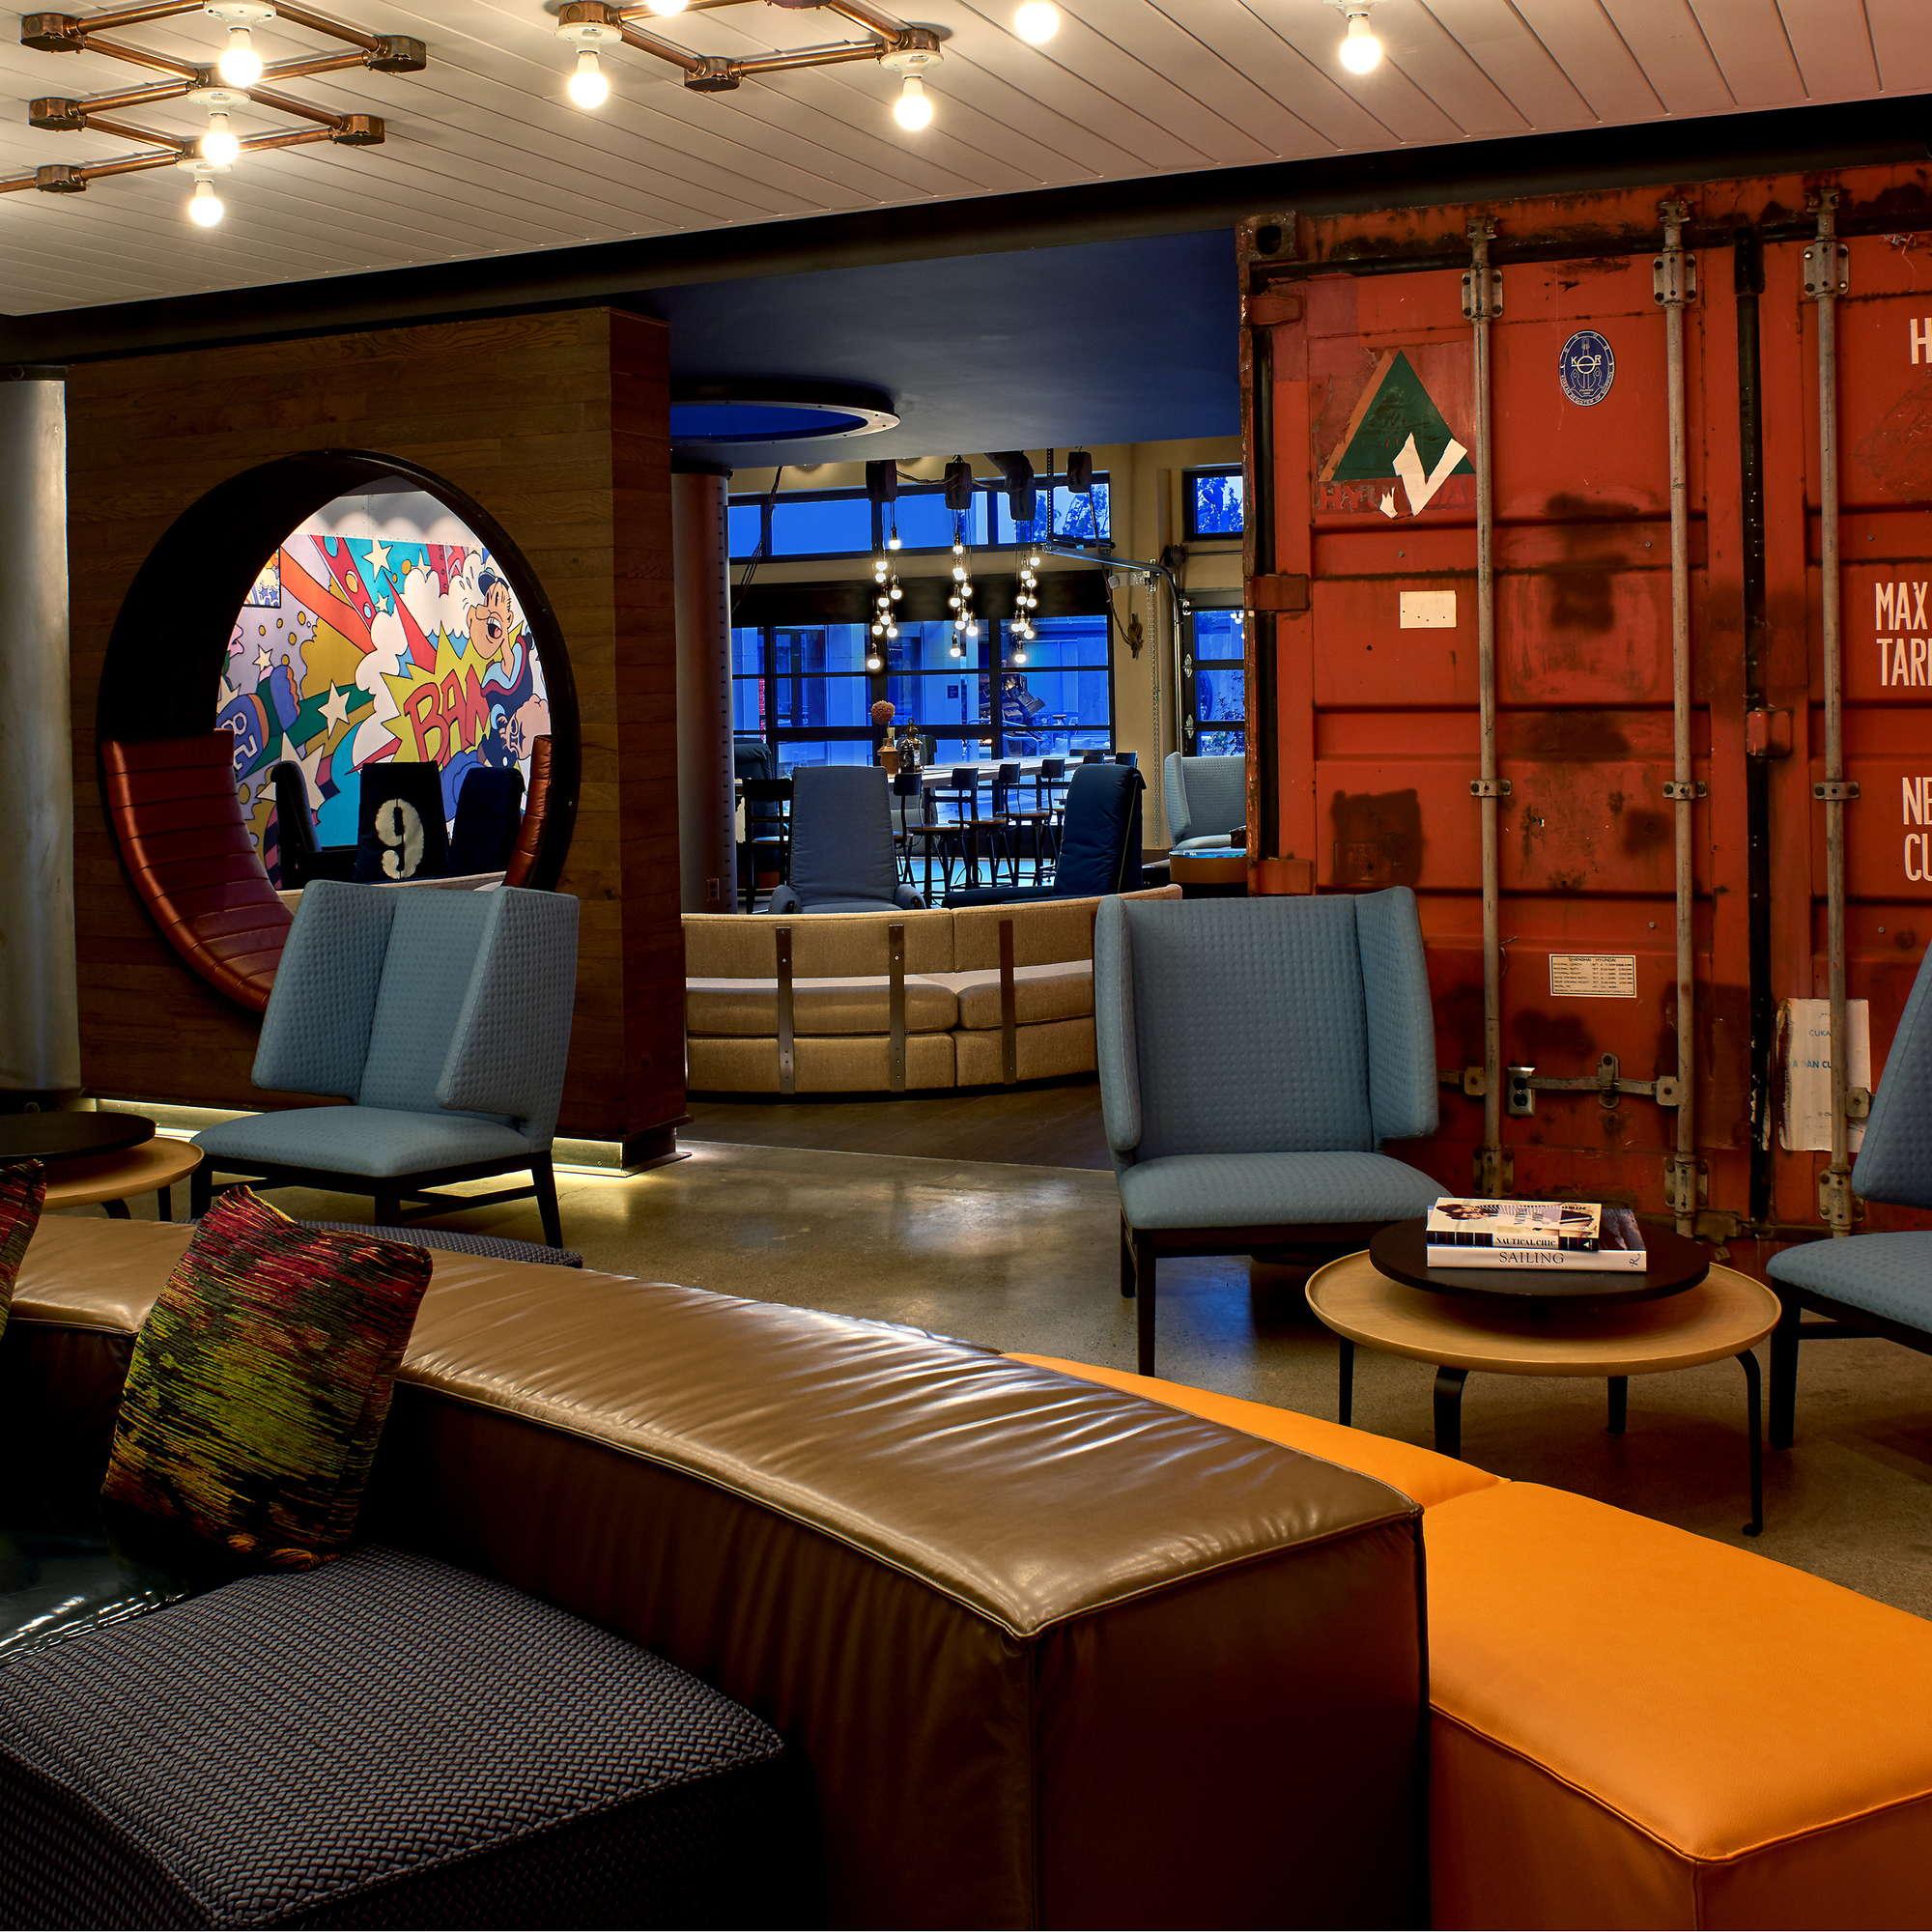 Hotel Zephyr Expert Review